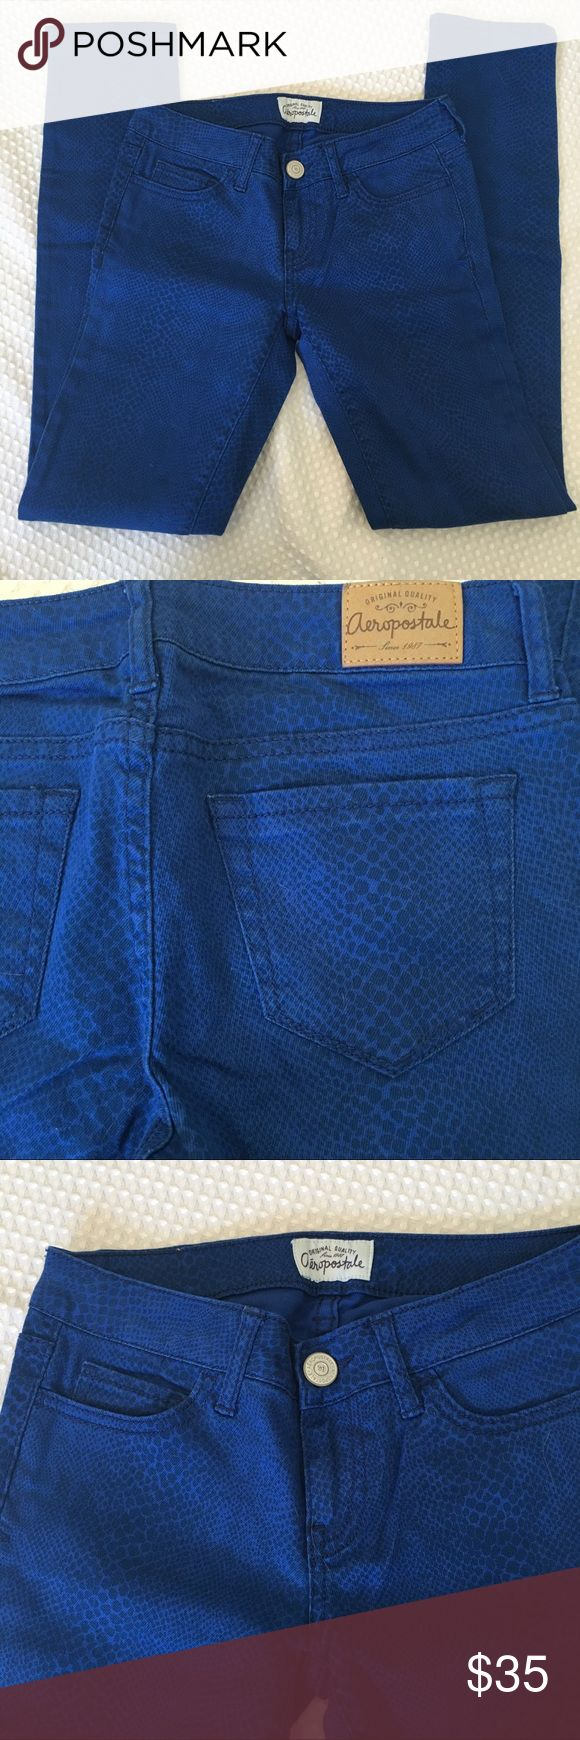 "Aeropostale Ashley Ultra Skinny Jeans Aeropostale Ashley Ultra Skinny Jeans in bright blue. Like new.  Snakeskin pattern. Size 00 regular.  28"" Inseam.  Cotton and spandex. Aeropostale Jeans Skinny"